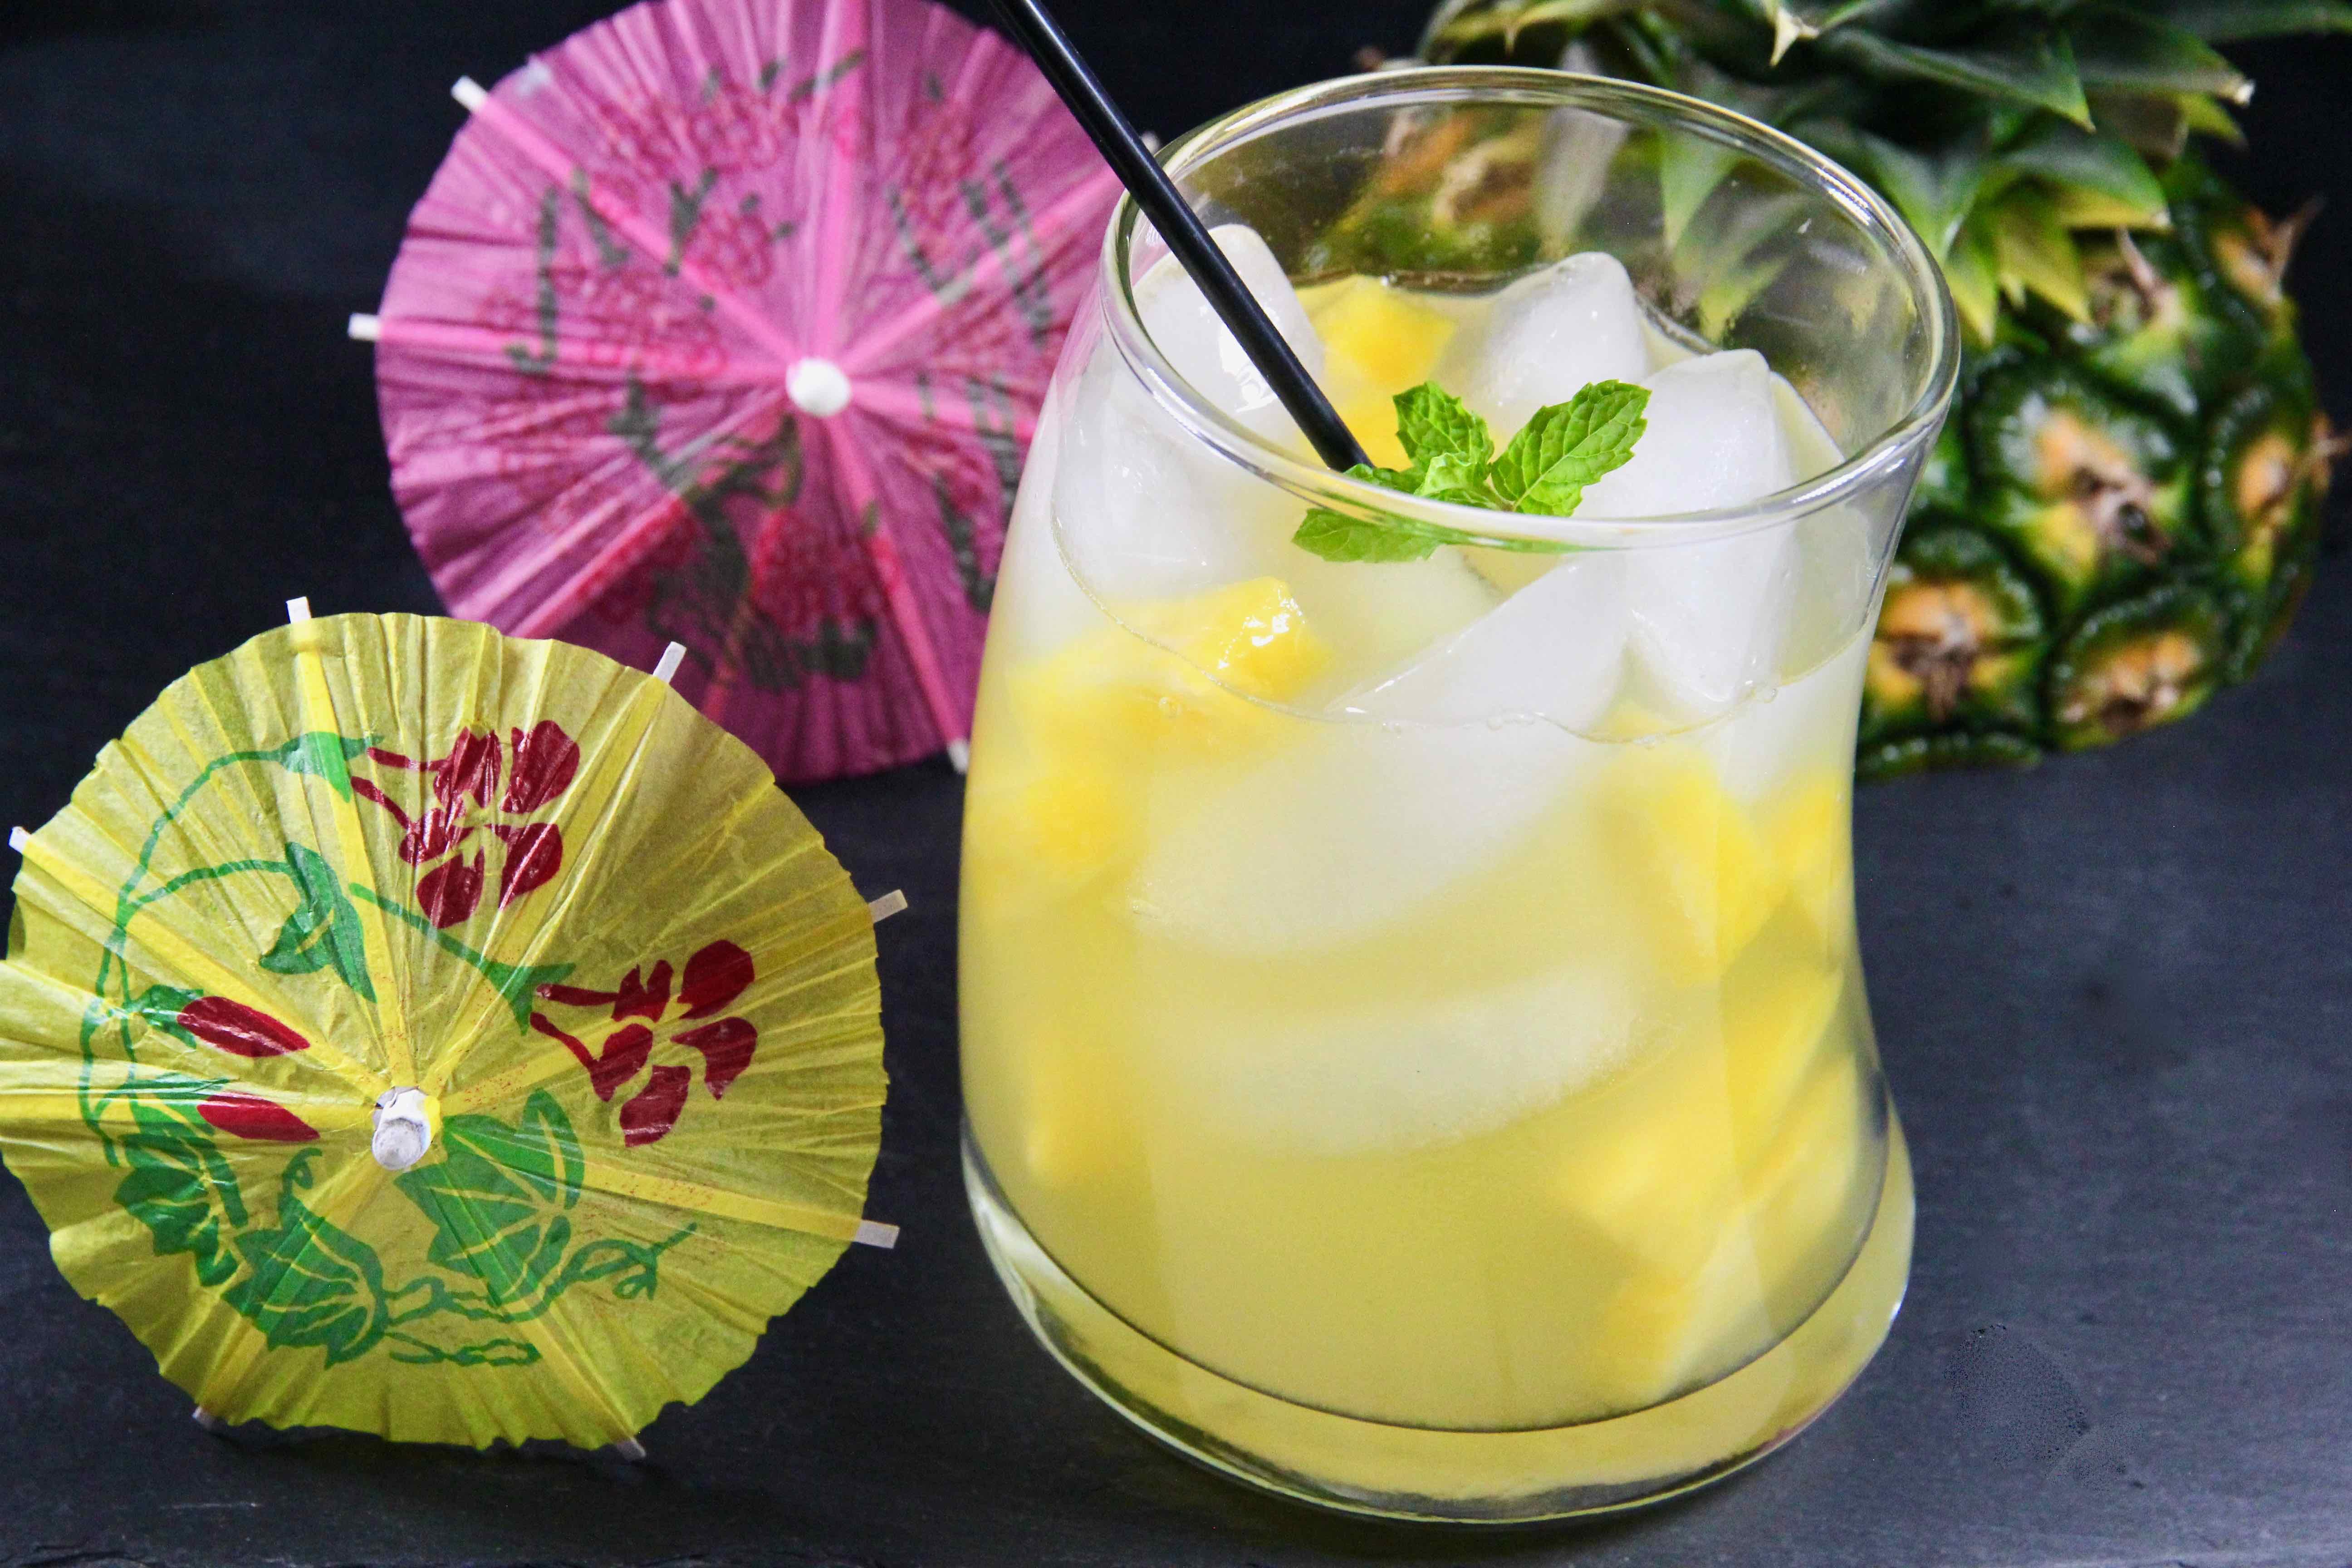 Pineapple White Wine Cocktail